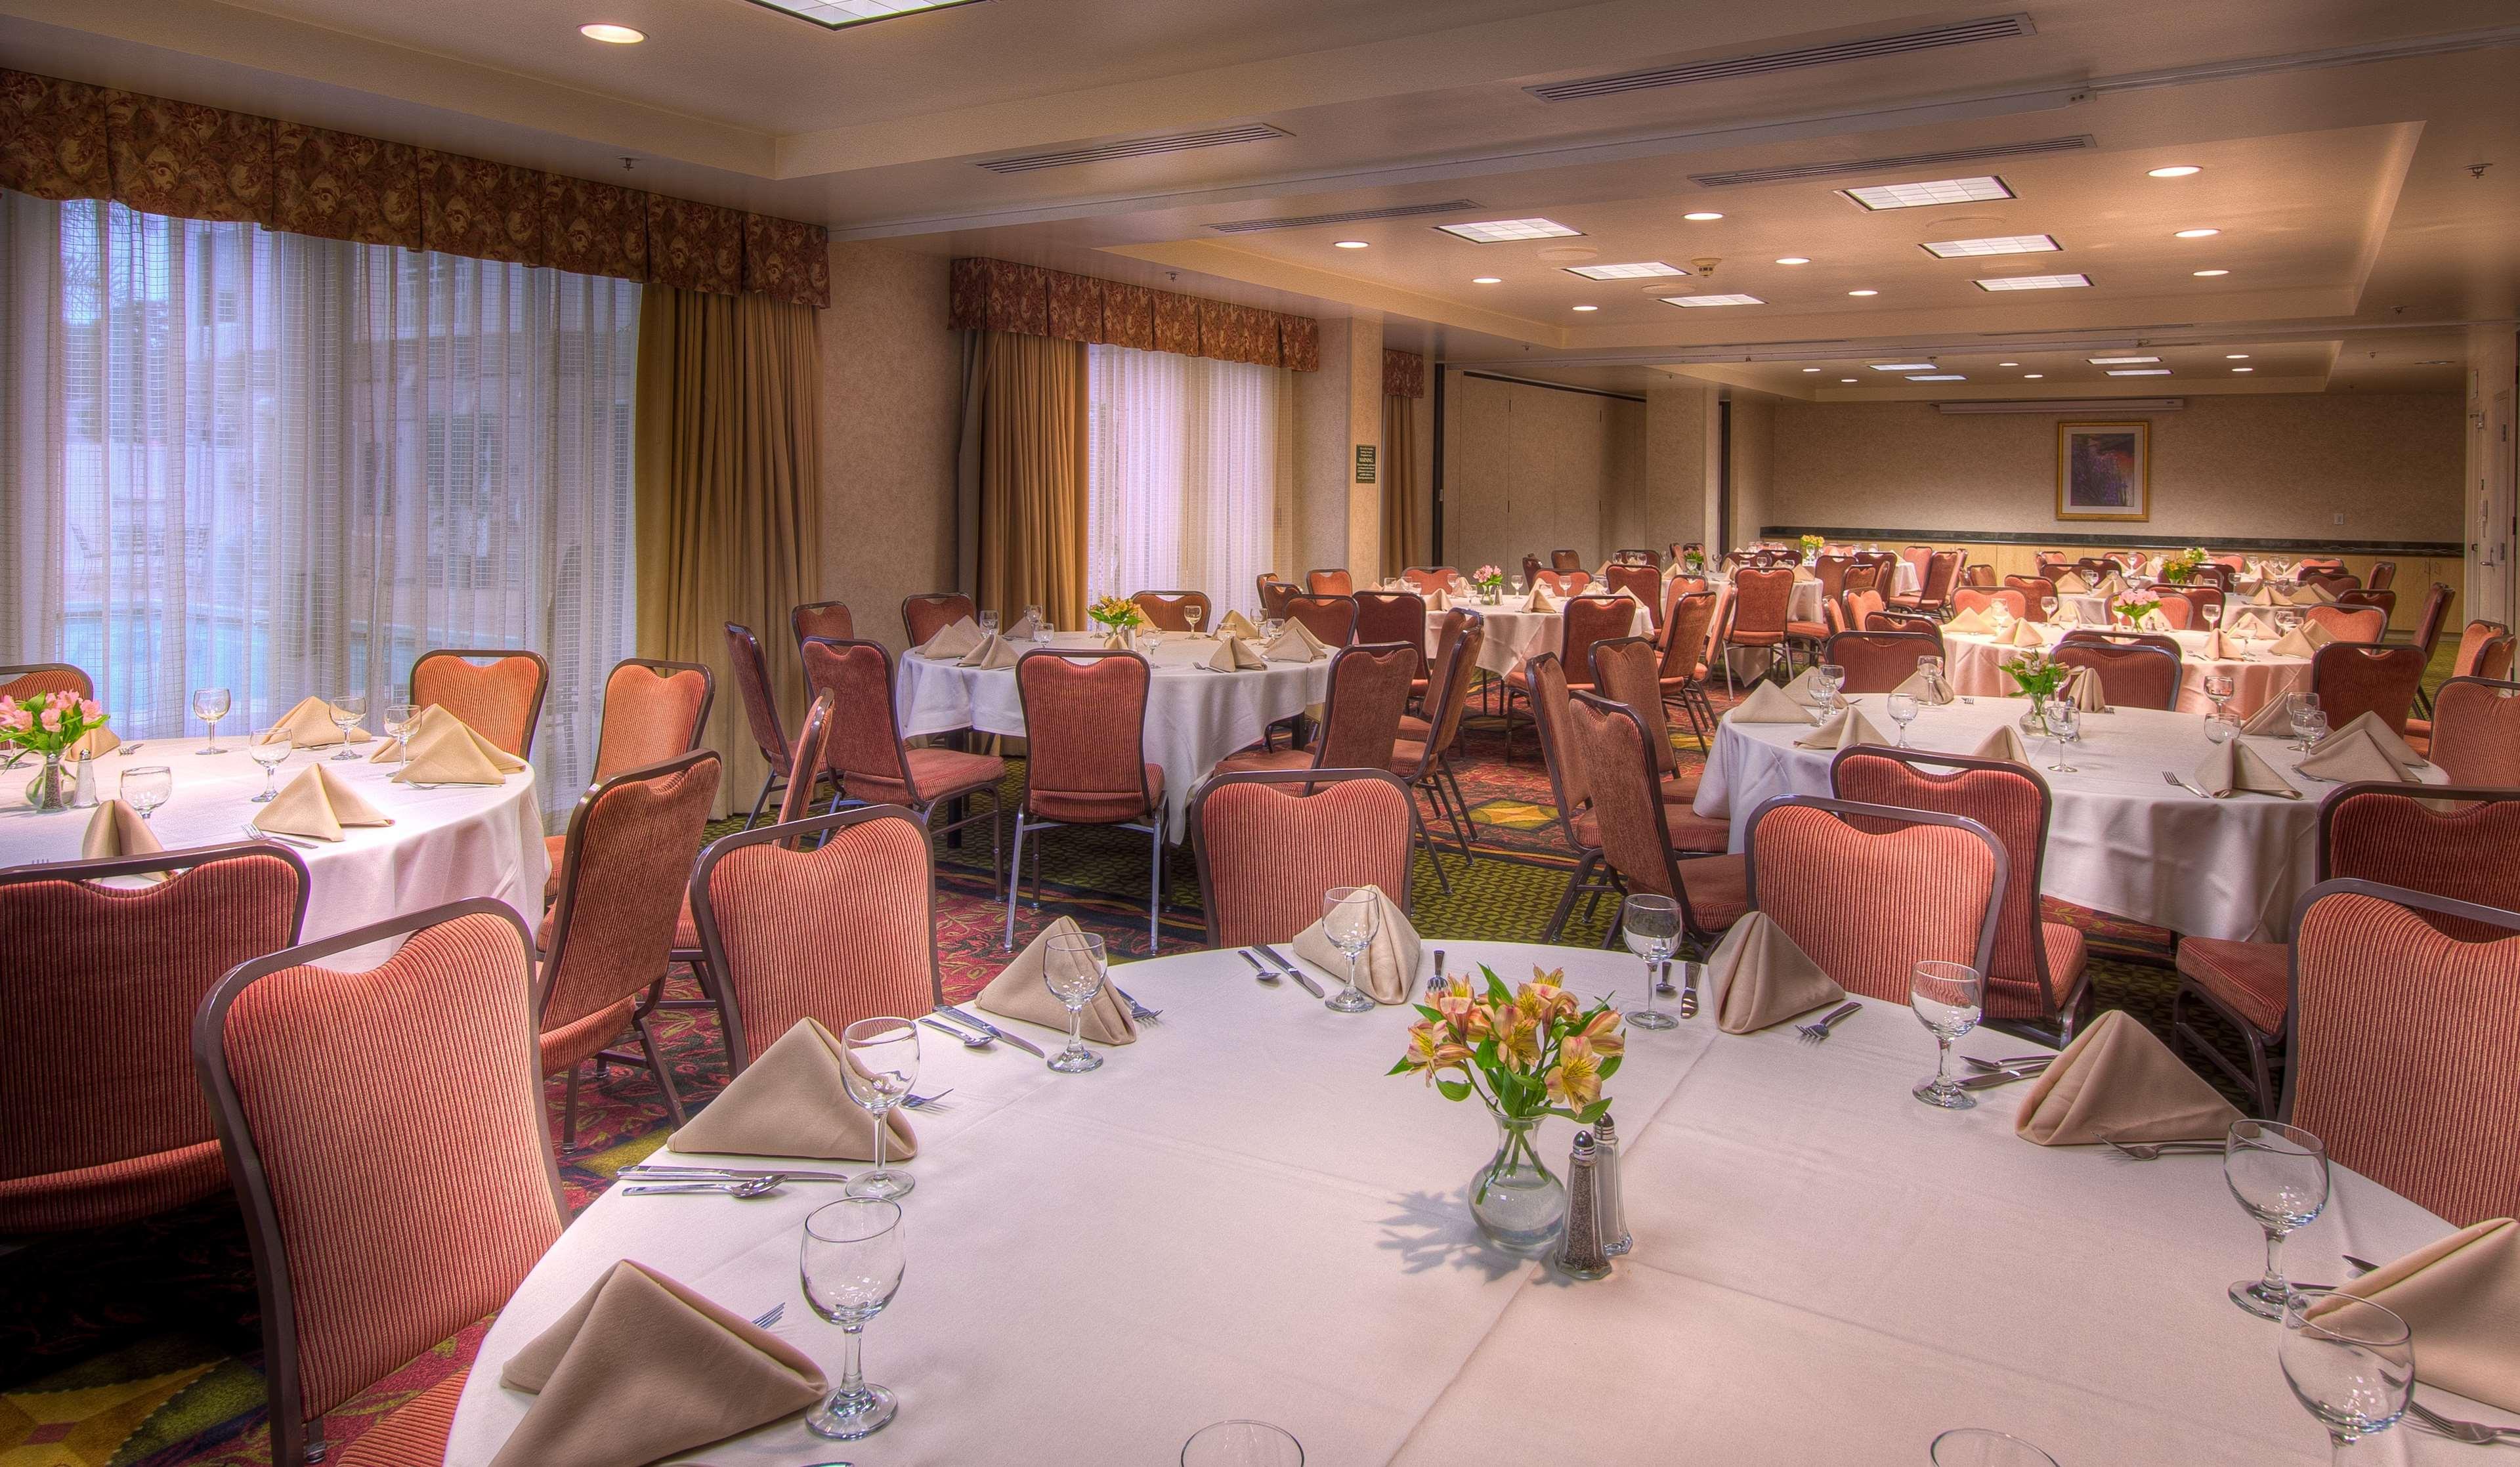 Hilton Garden Inn Mountain View image 10